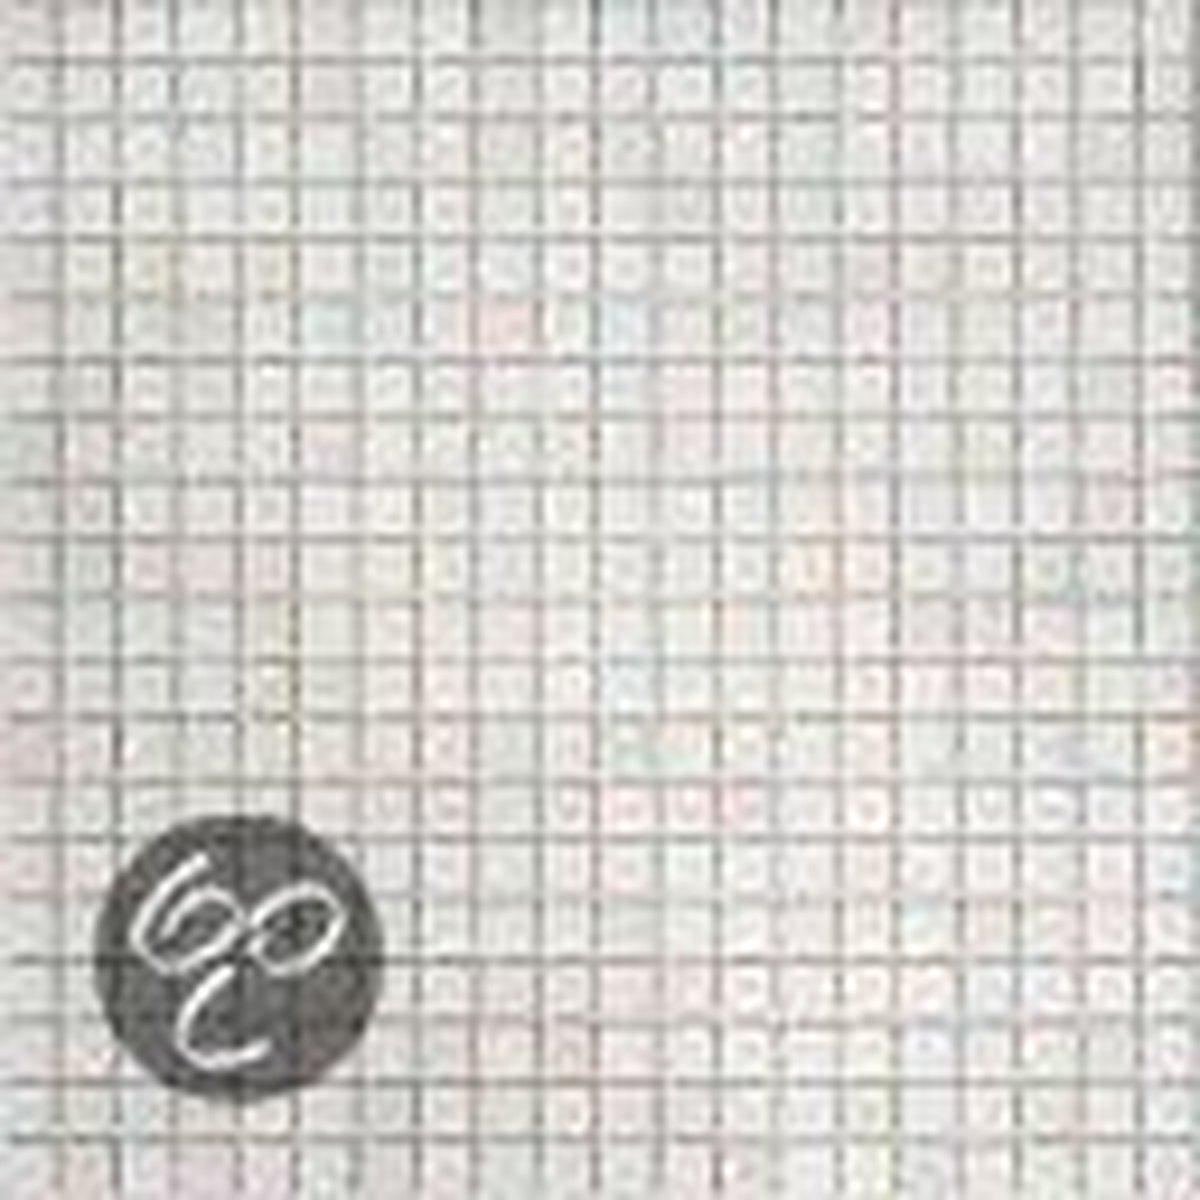 Alfa Mosaico Mozaiek Sabroso wit parelmoer glans effect 1,5x1,5x0,4 cm -  Wit Prijs per 1 matje. - Alfa Mosaico